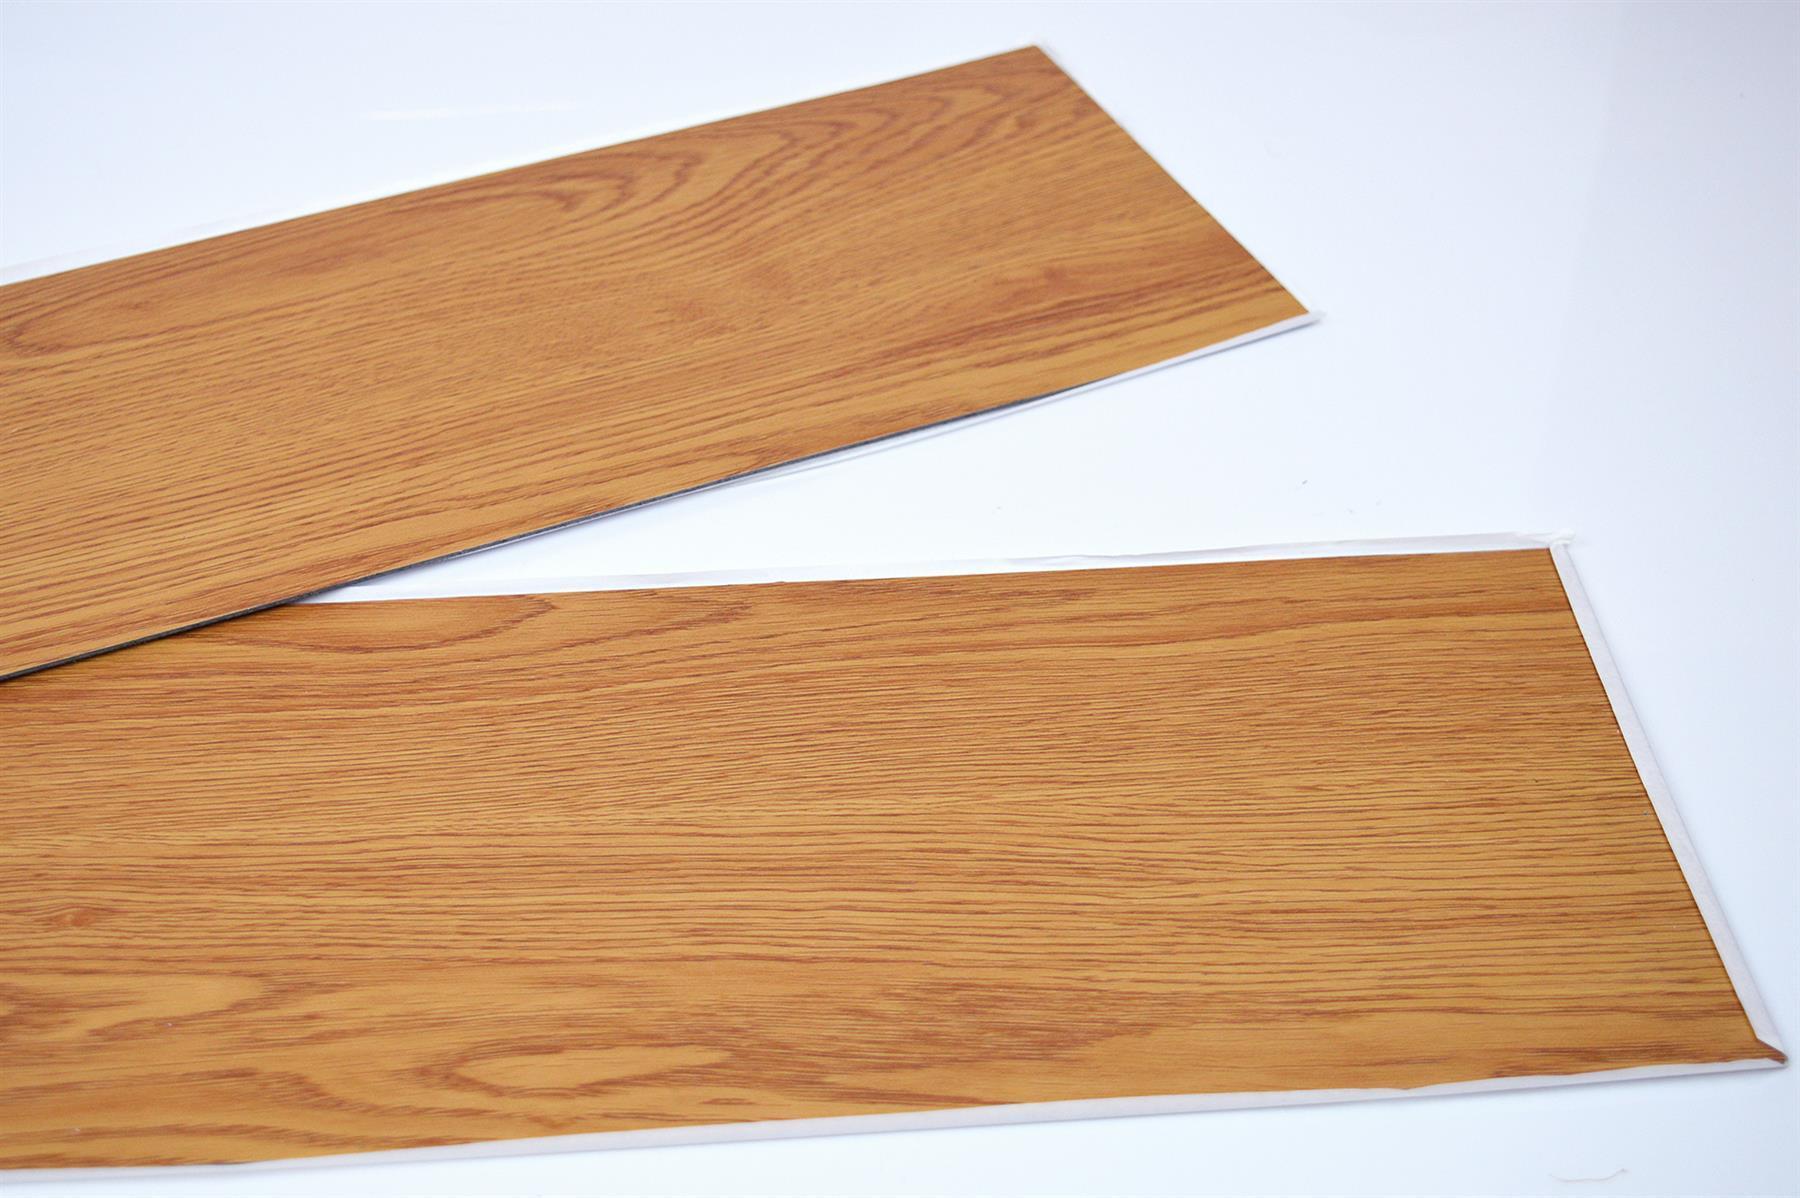 thumbnail 7 - Floor Planks Tiles Self Adhesive Vinyl Brown Wood Flooring Kitchen Bathroom